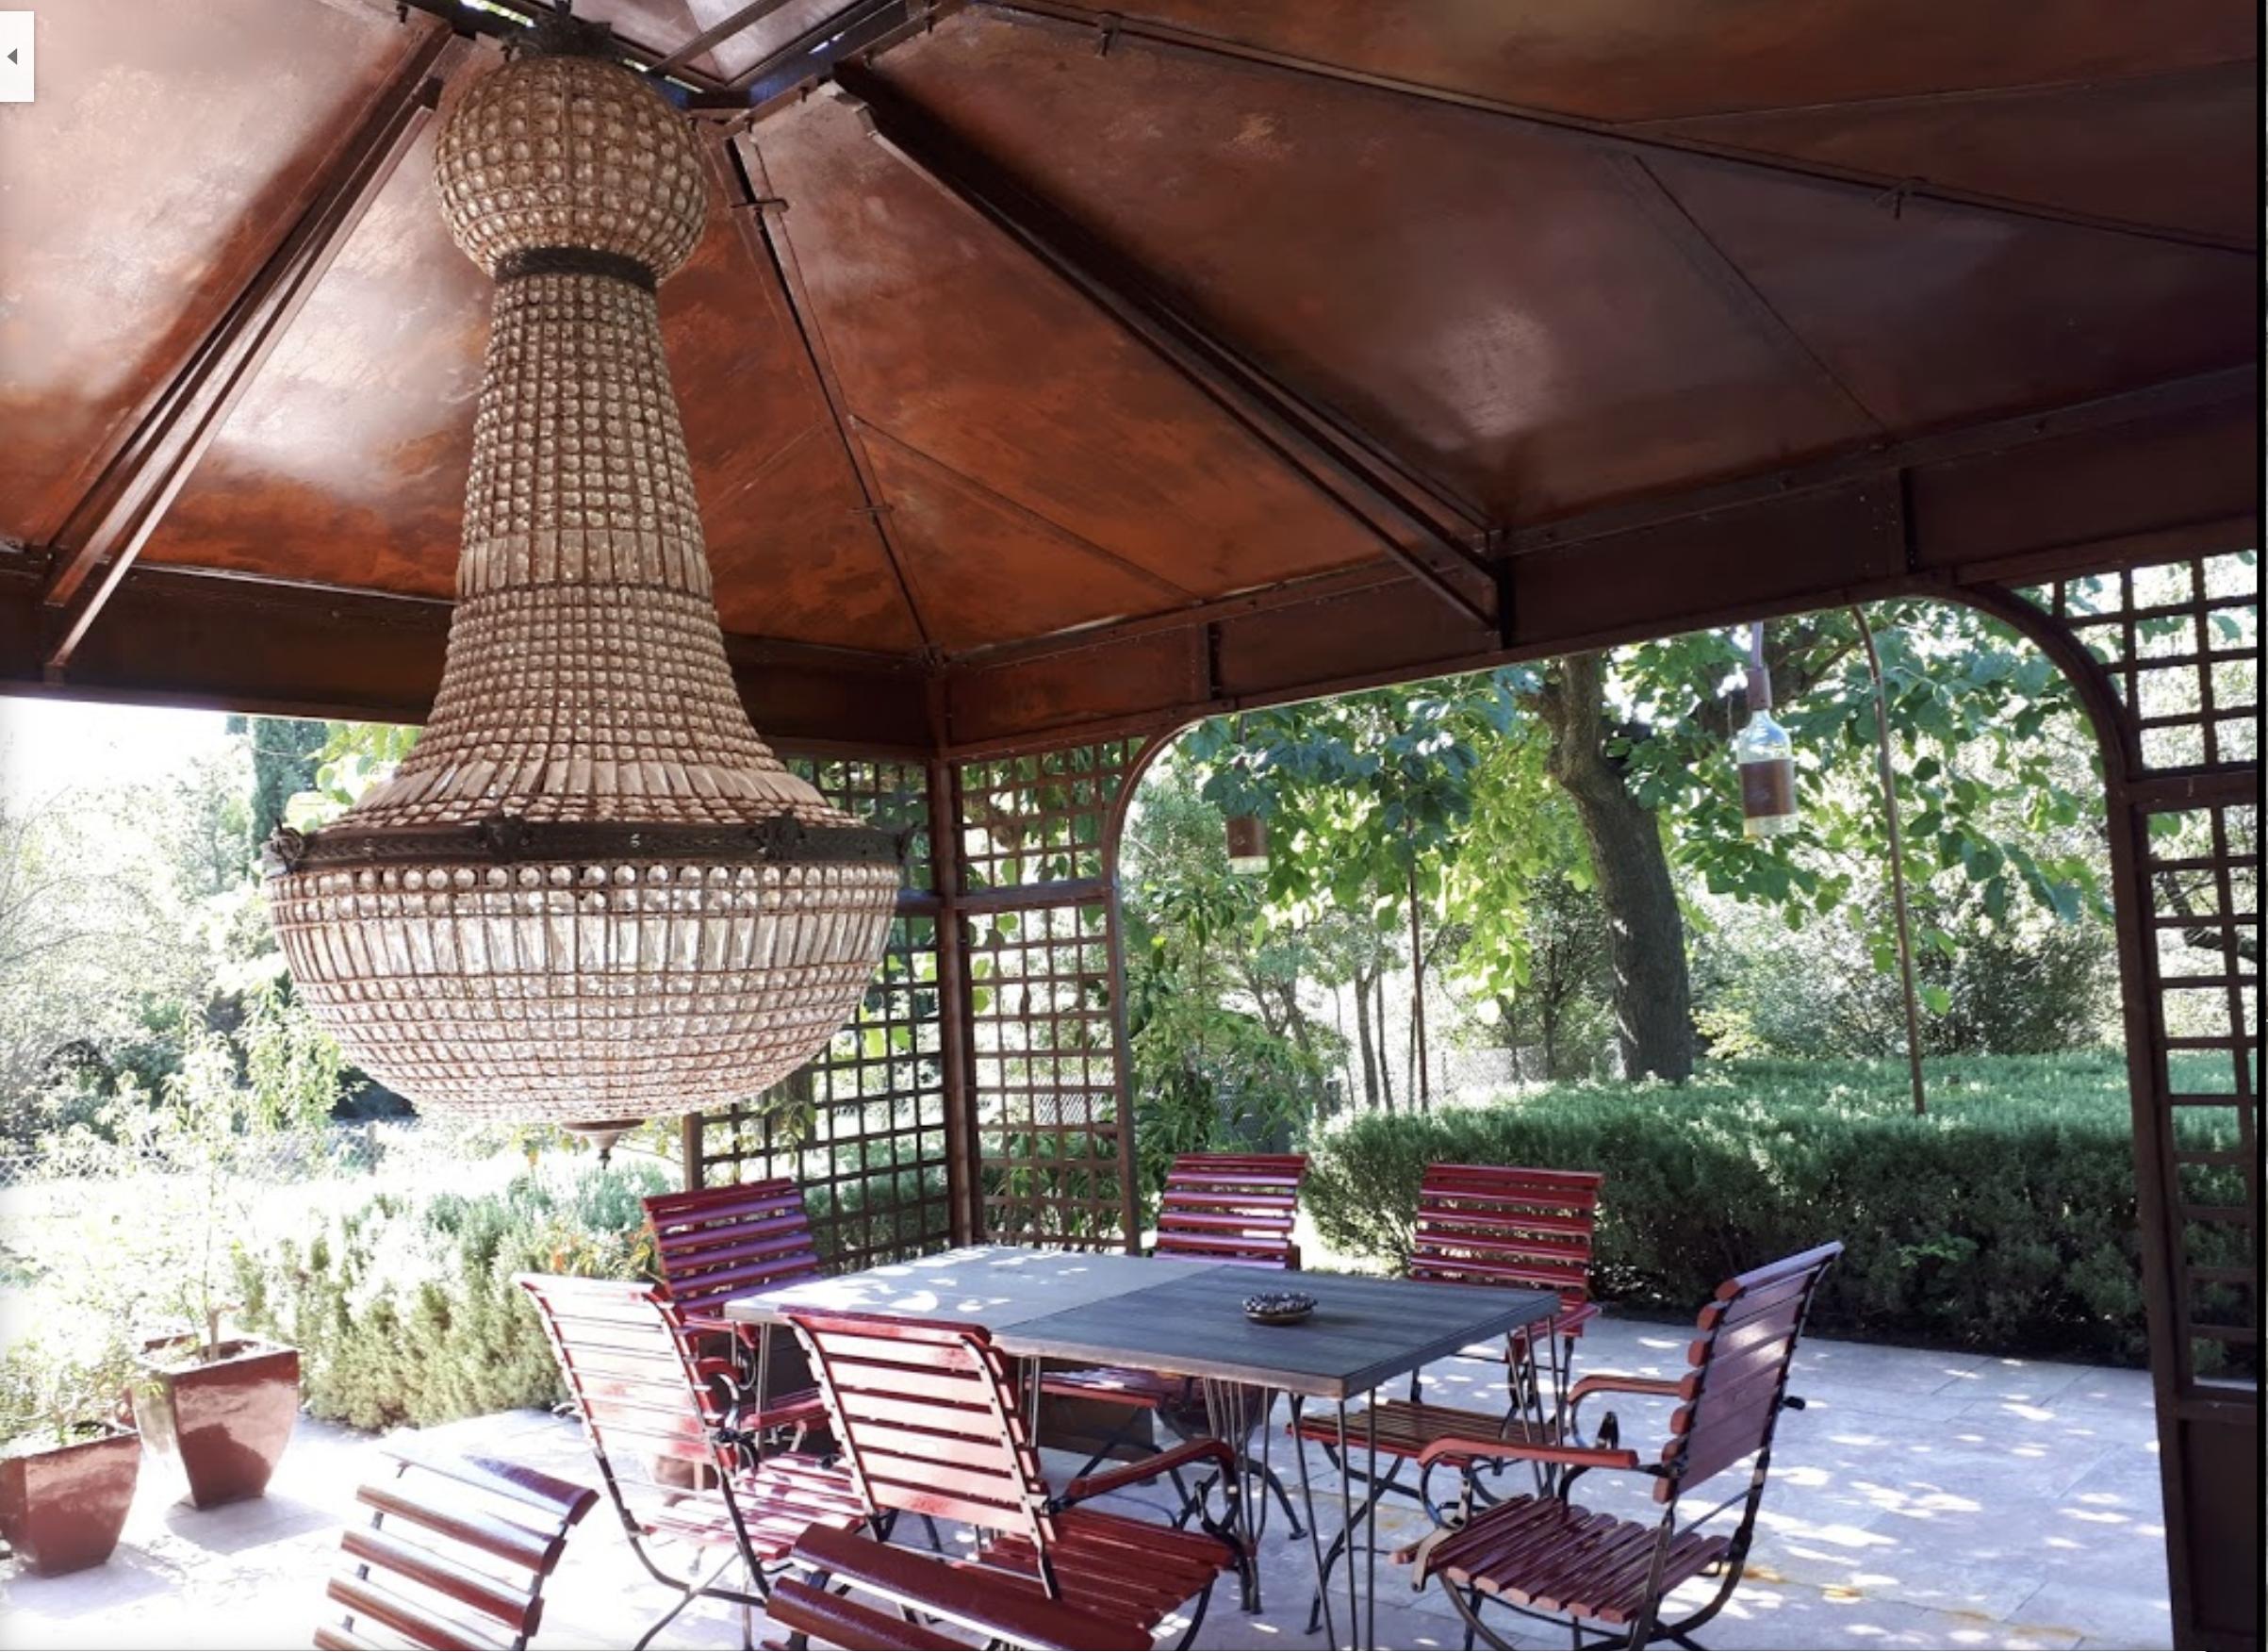 Restaurant La Table, Assignan Outdoor decor, Outdoor